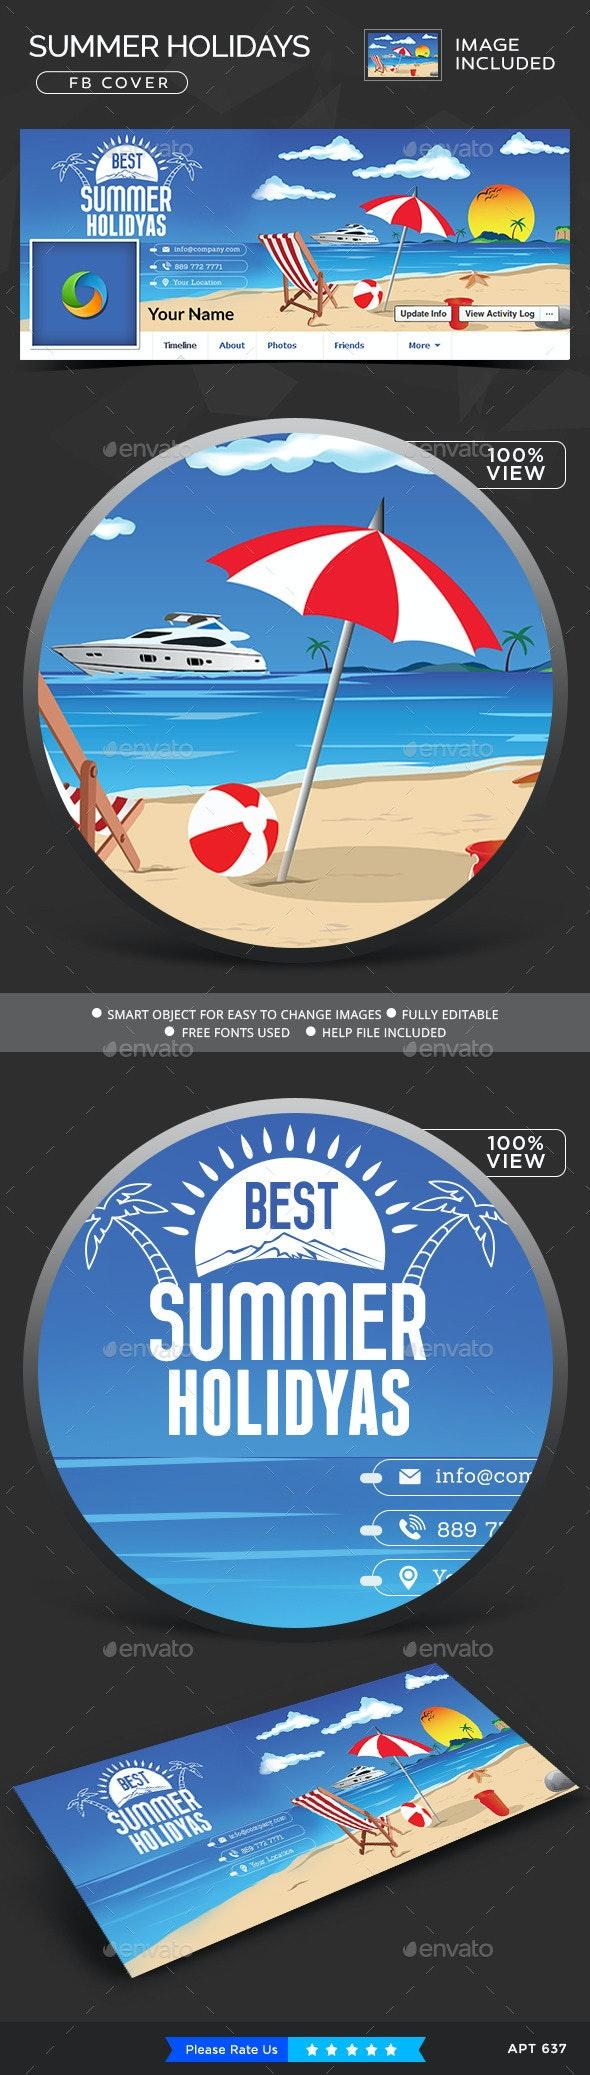 Summer Holidays Facebook Cover - Facebook Timeline Covers Social Media